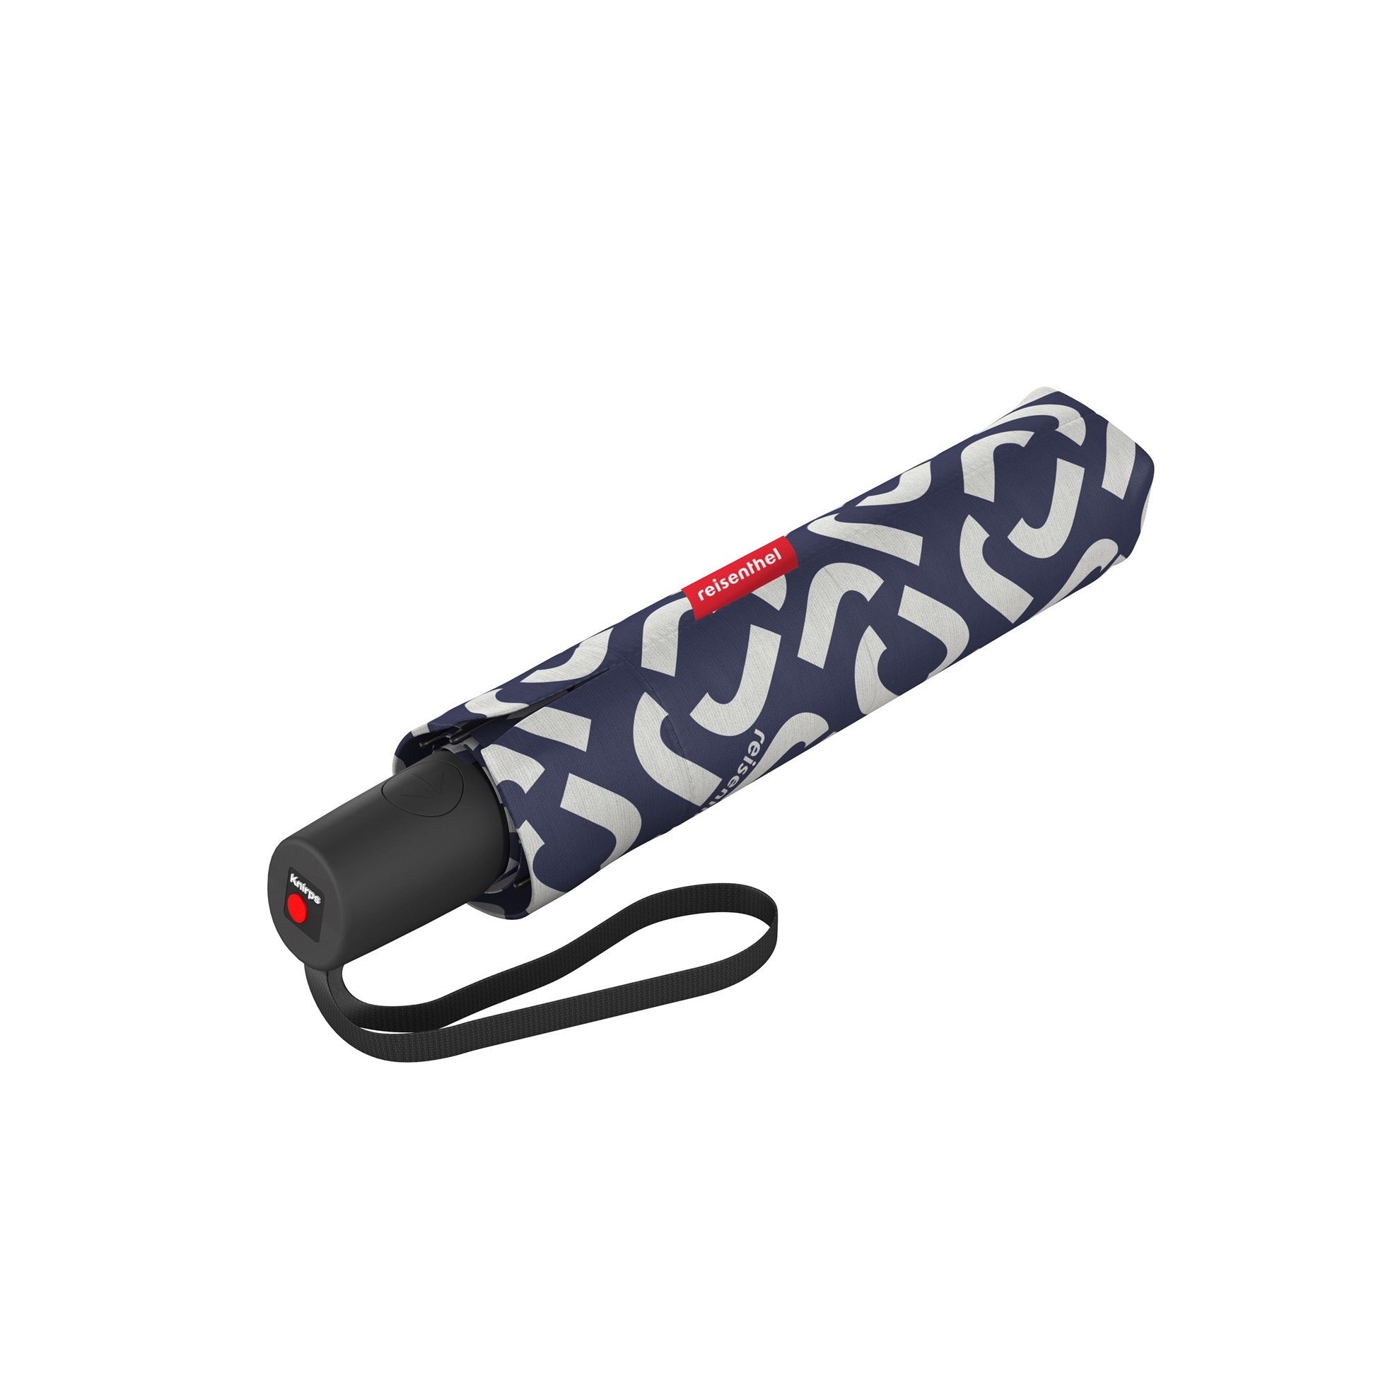 Deštník Umbrella Pocket Duomatic signature navy_0